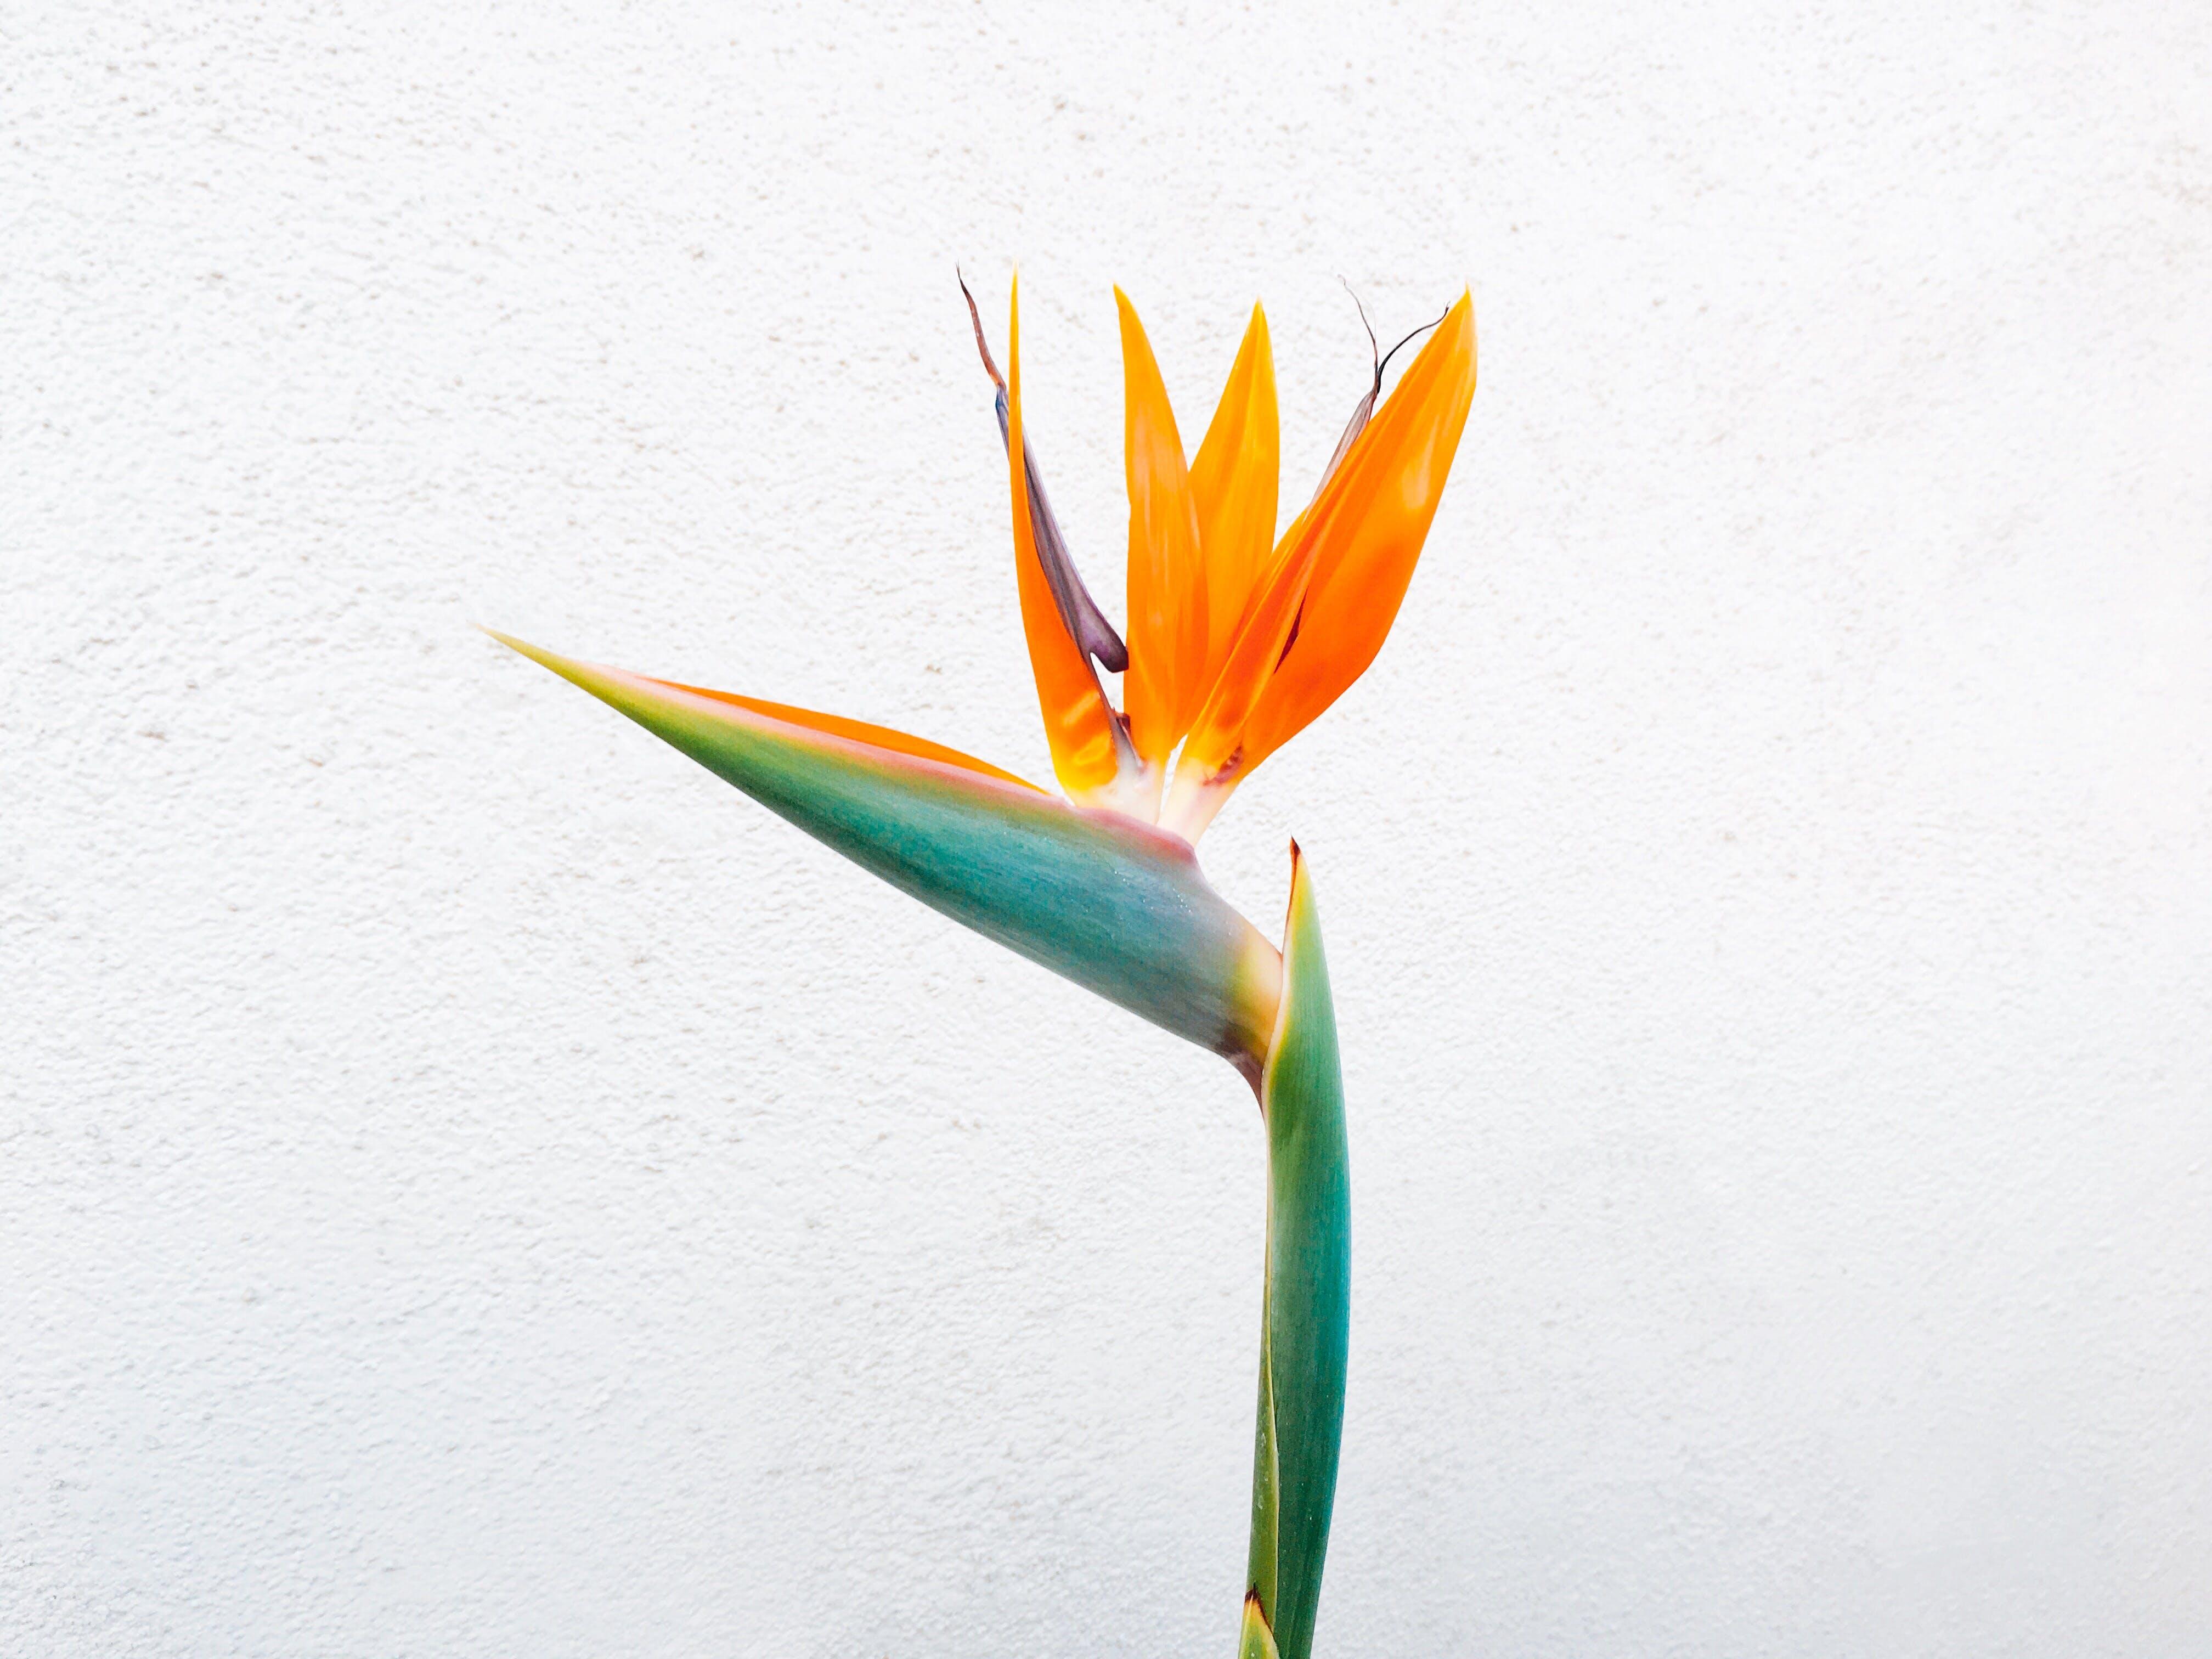 Orange Birds of Paradise Flower Closeup Photo